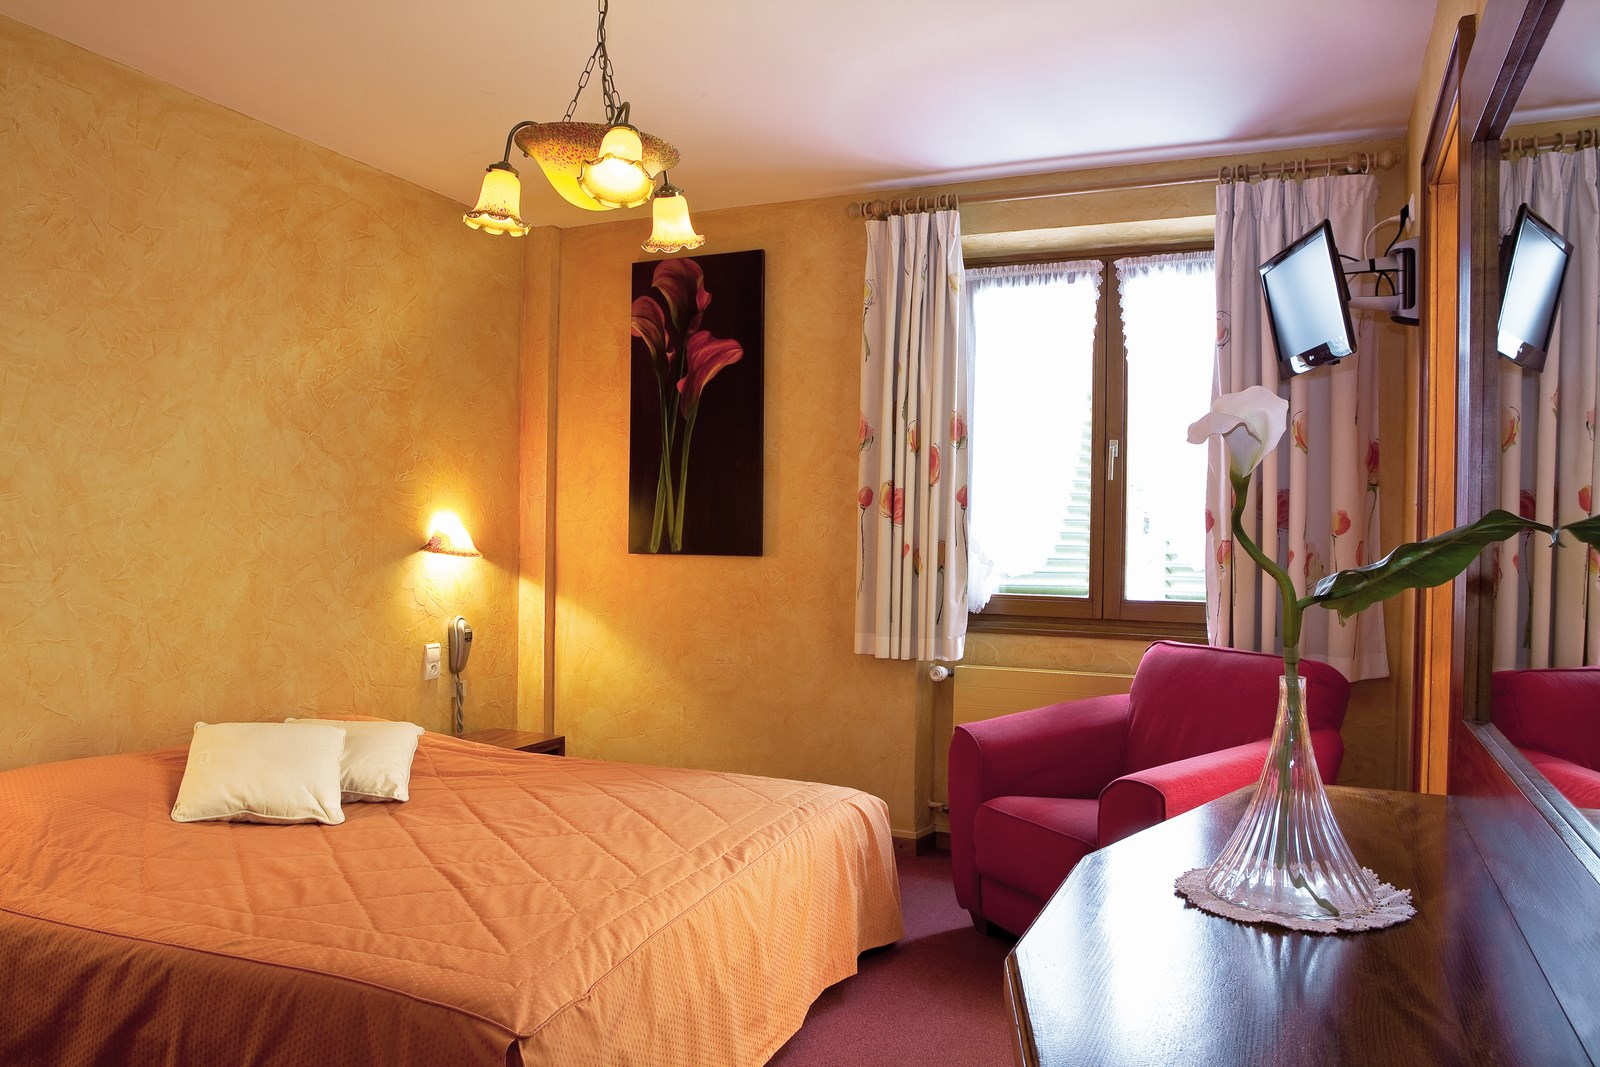 H tel a la vignette saint hippolyte 68590 recherche for Hotel recherche